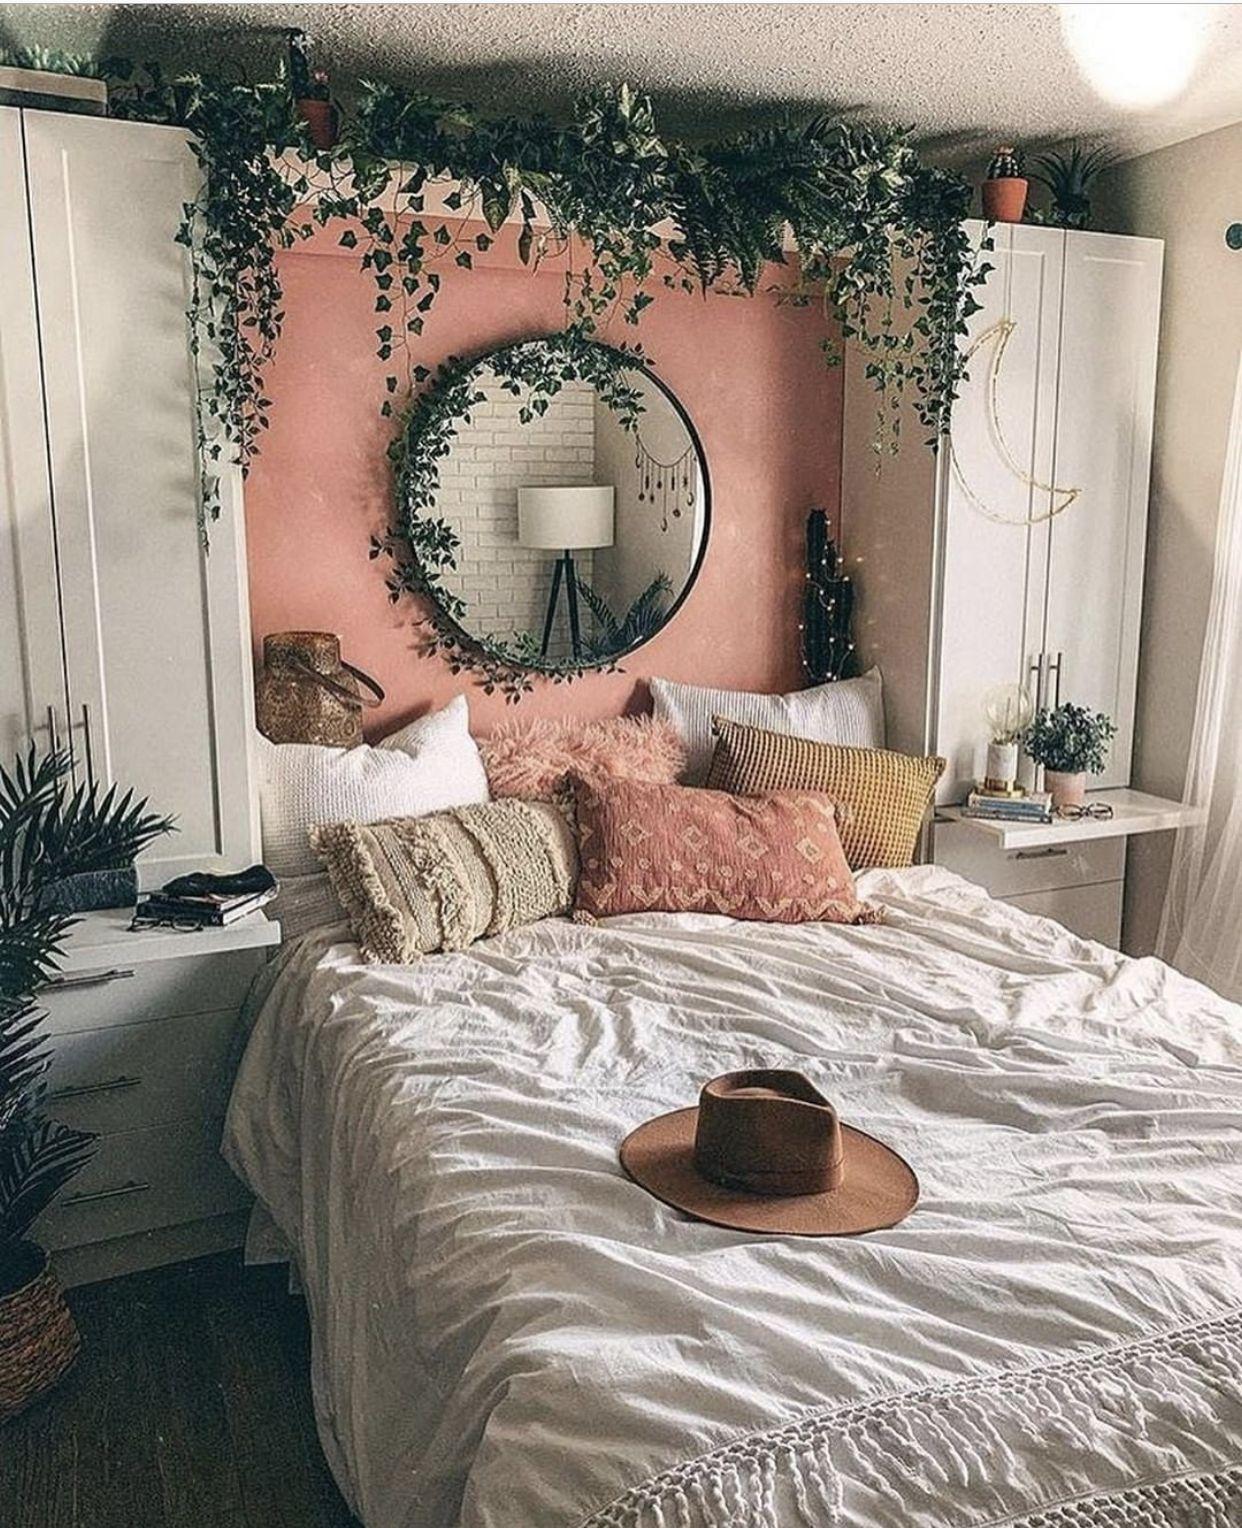 Beautiful Diy Fairy Light For Minimalist Bedroom Decoration In 2020 Aesthetic Room Decor Aesthetic Bedroom Warm Home Decor